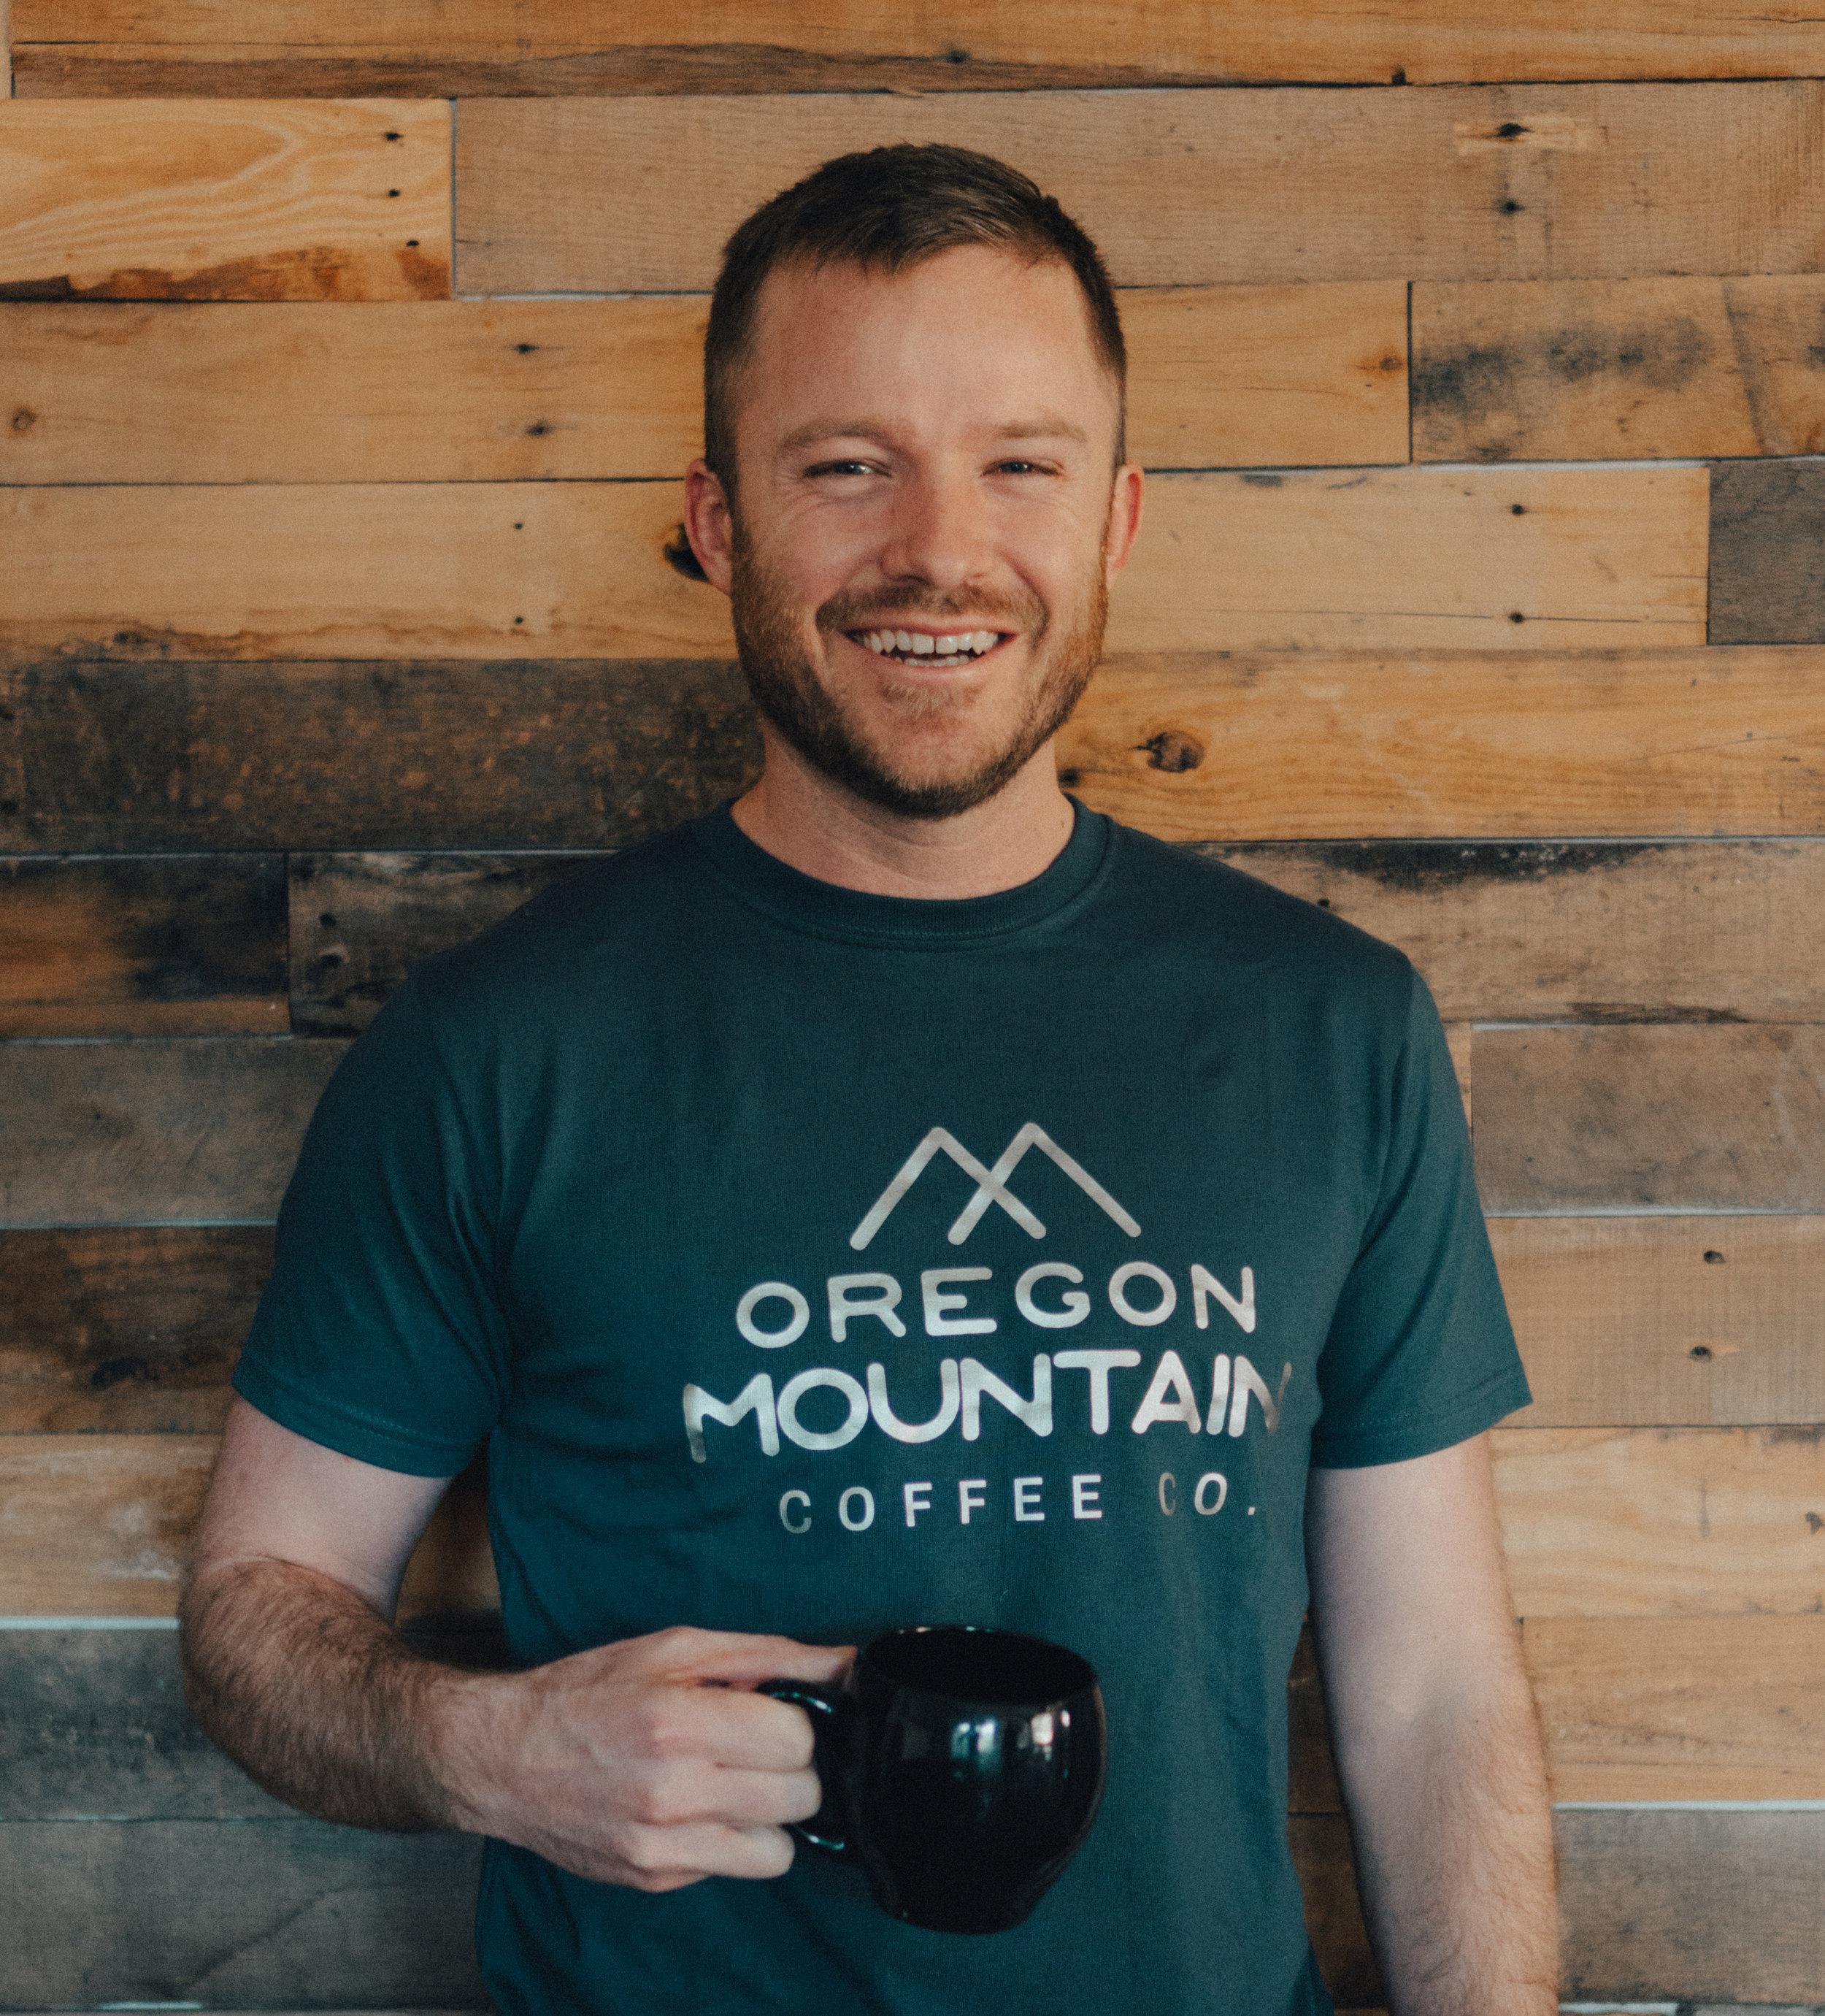 Organic Men's T-shirts